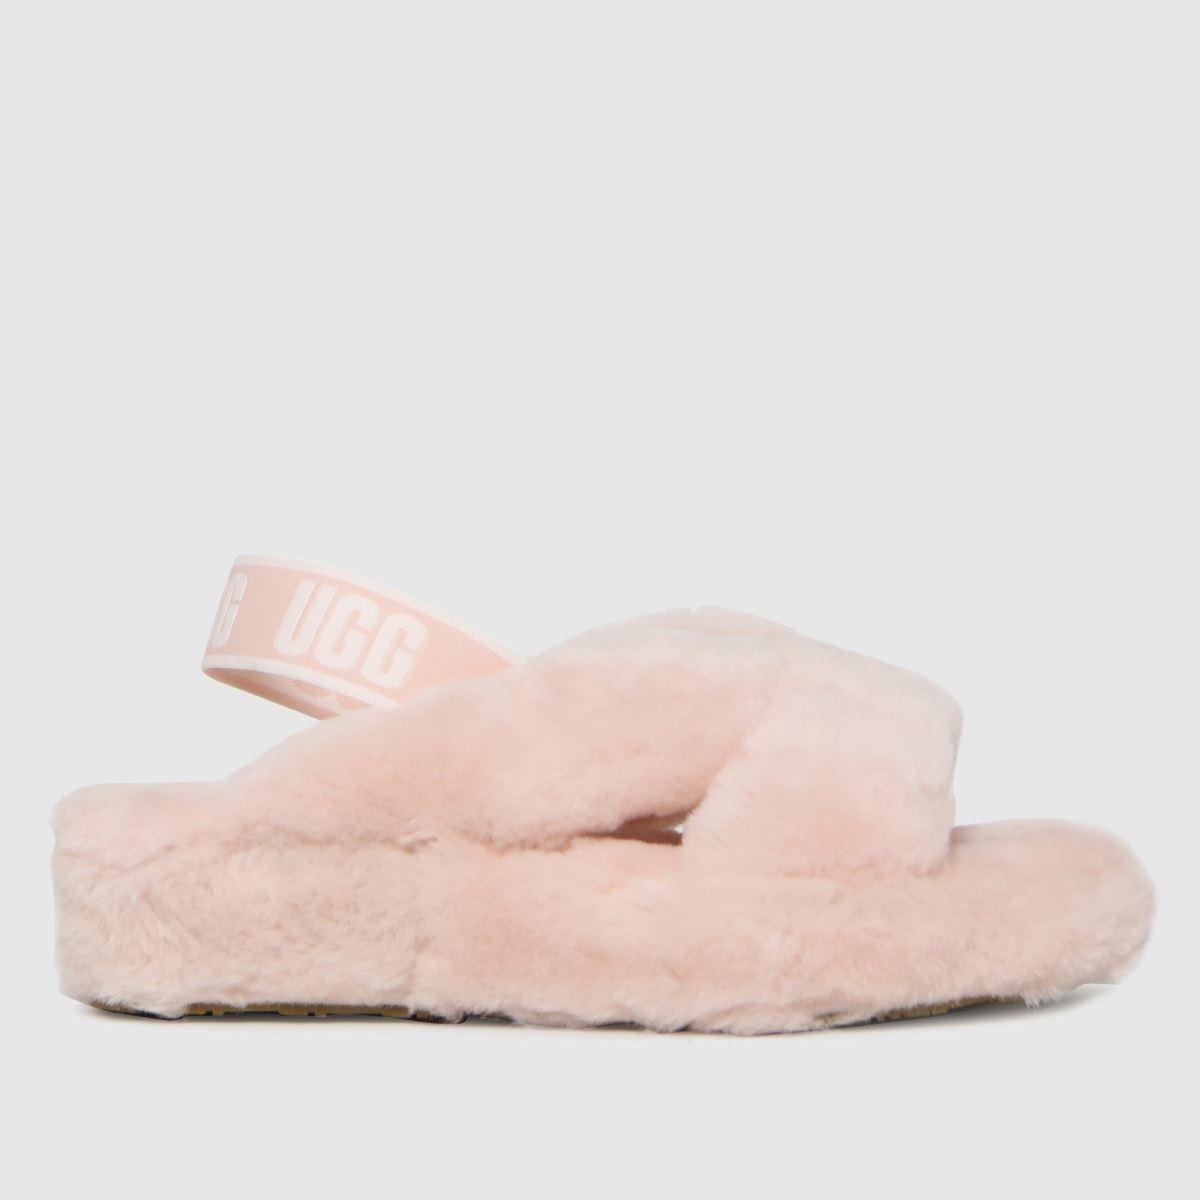 UGG Pale Pink Fab Yeah Slide Slippers